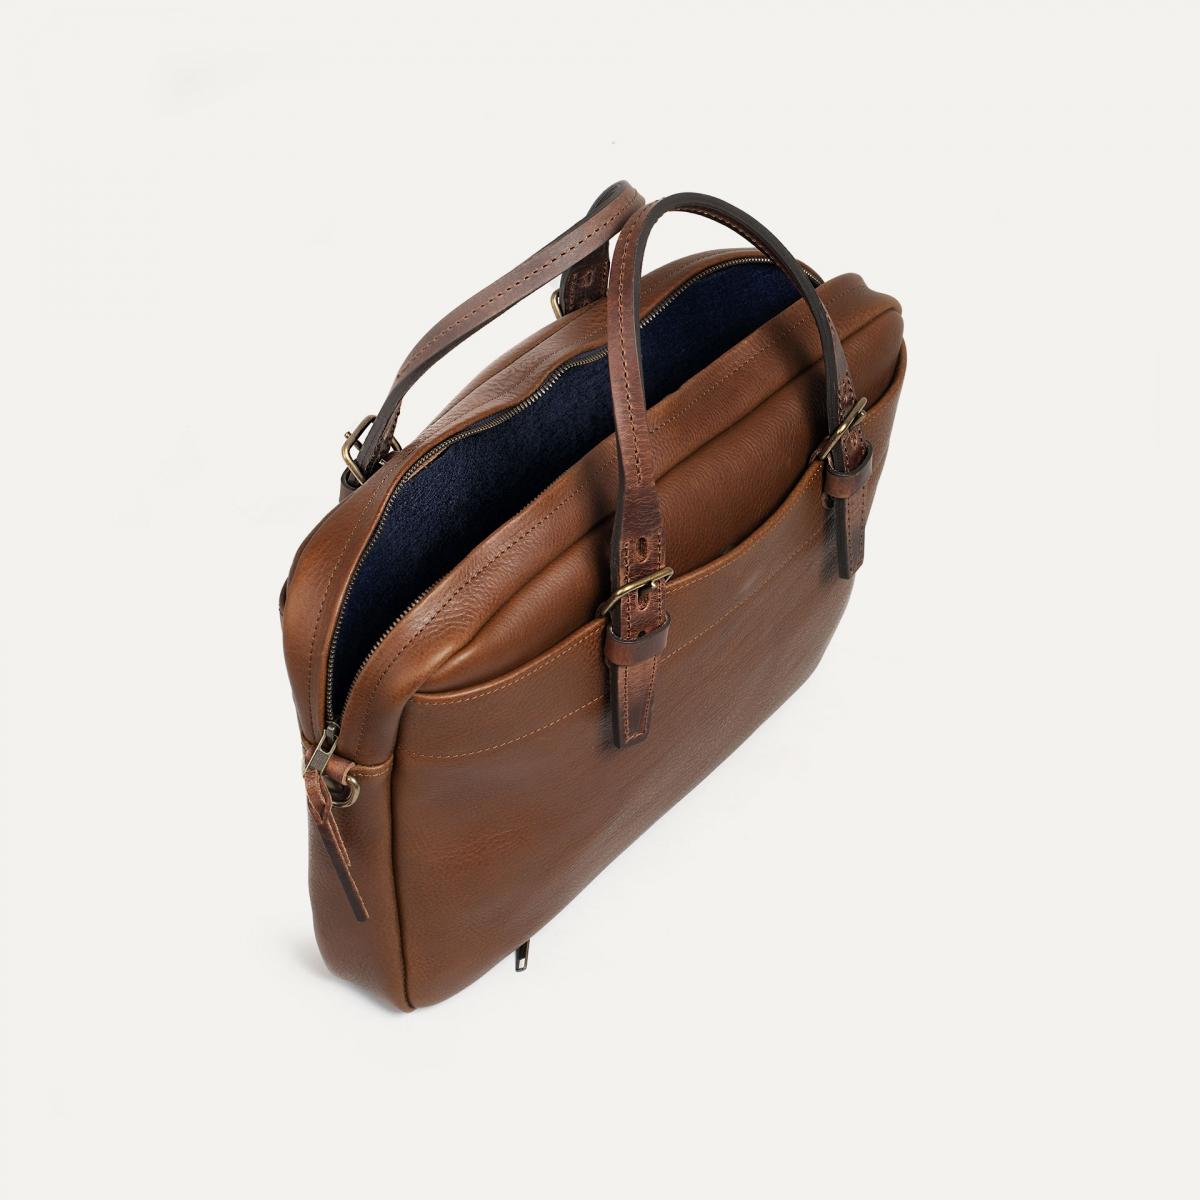 Folder Business bag - Cuba Libre (image n°4)